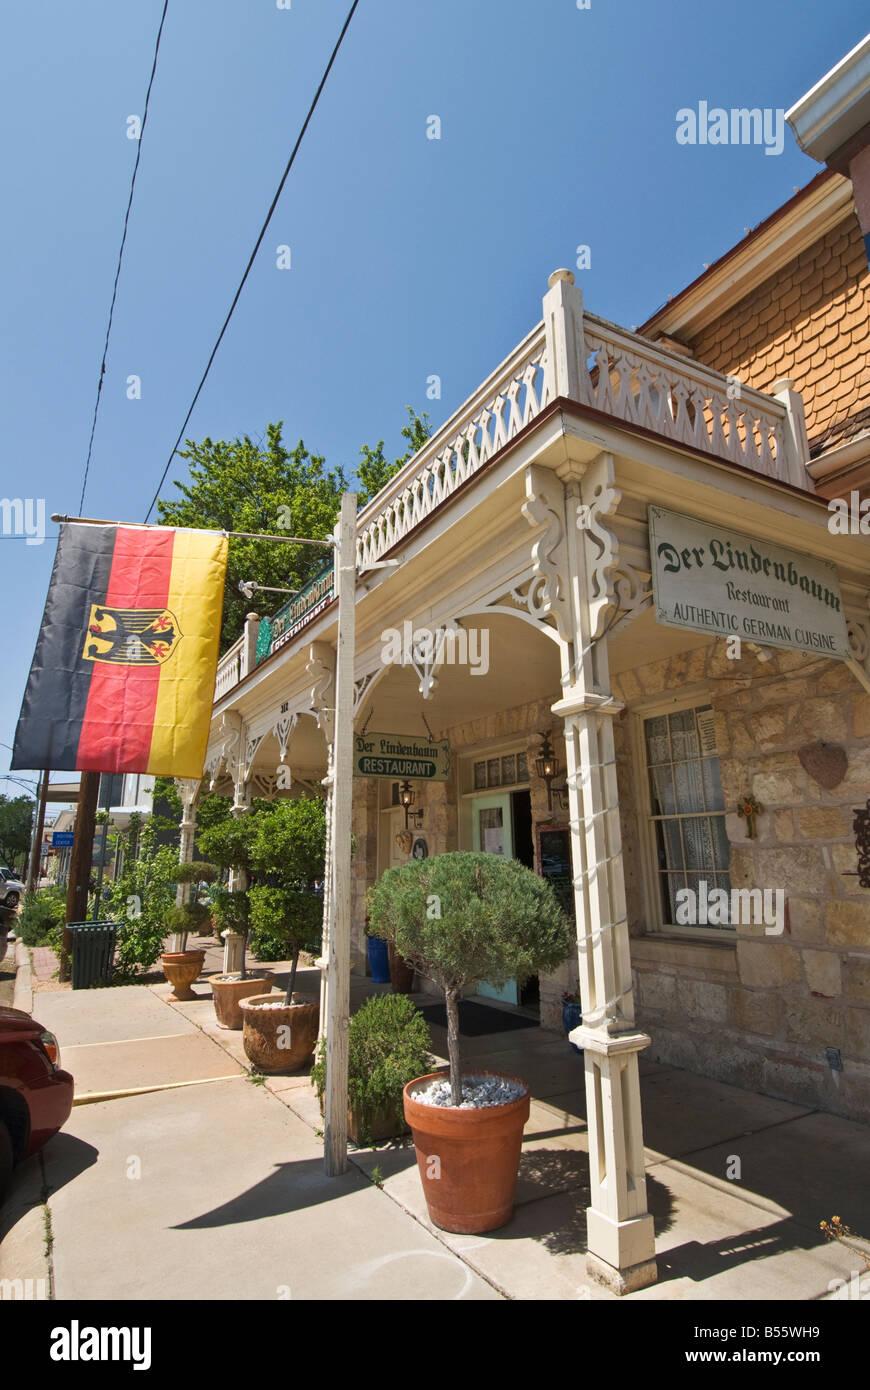 Texas Hill Country Fredericksburg Der Lindenbaum German Cuisine